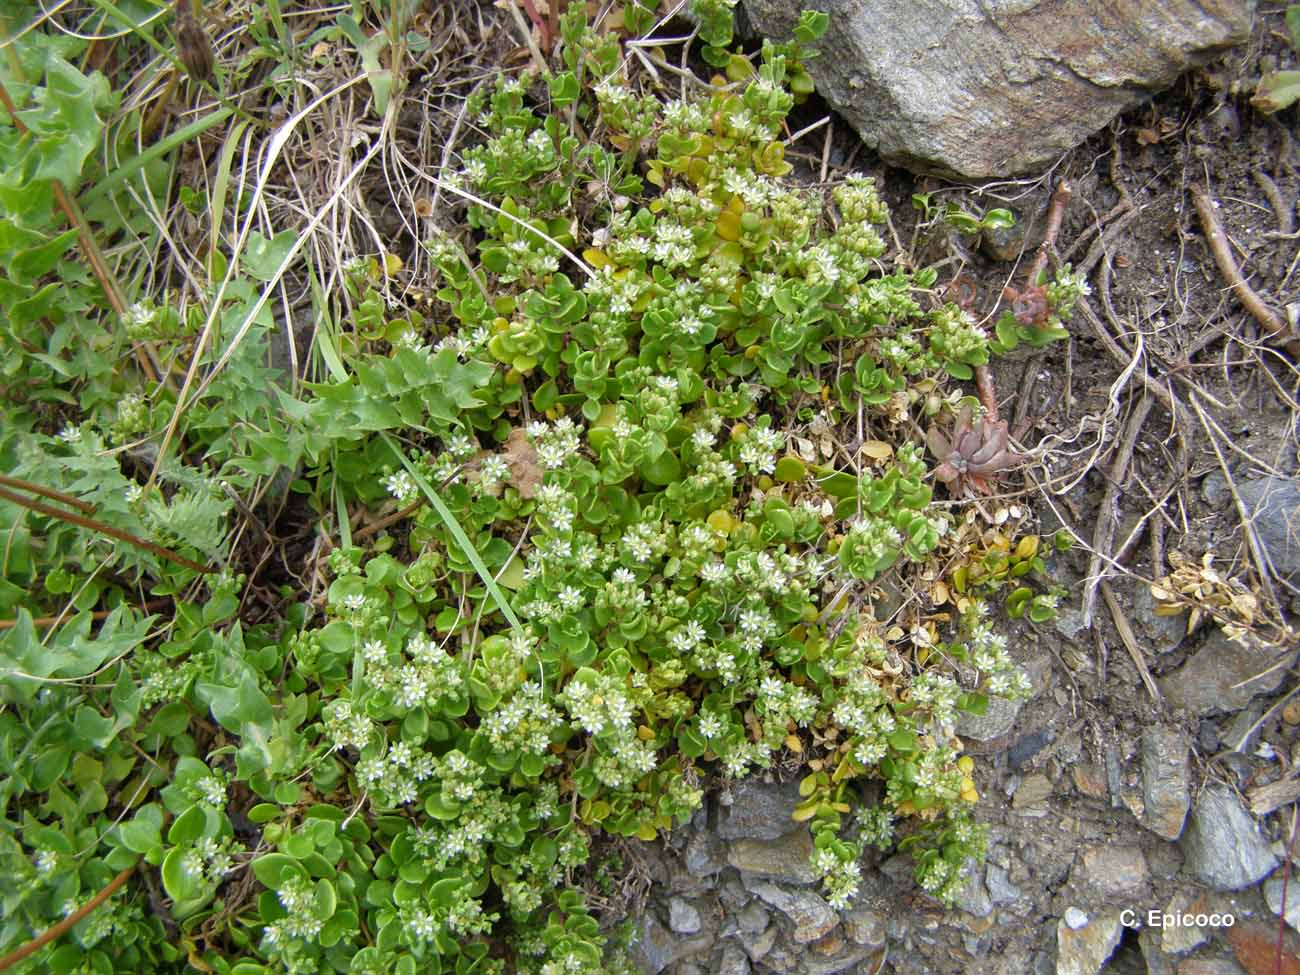 Polycarpon polycarpoides subsp. catalaunicum